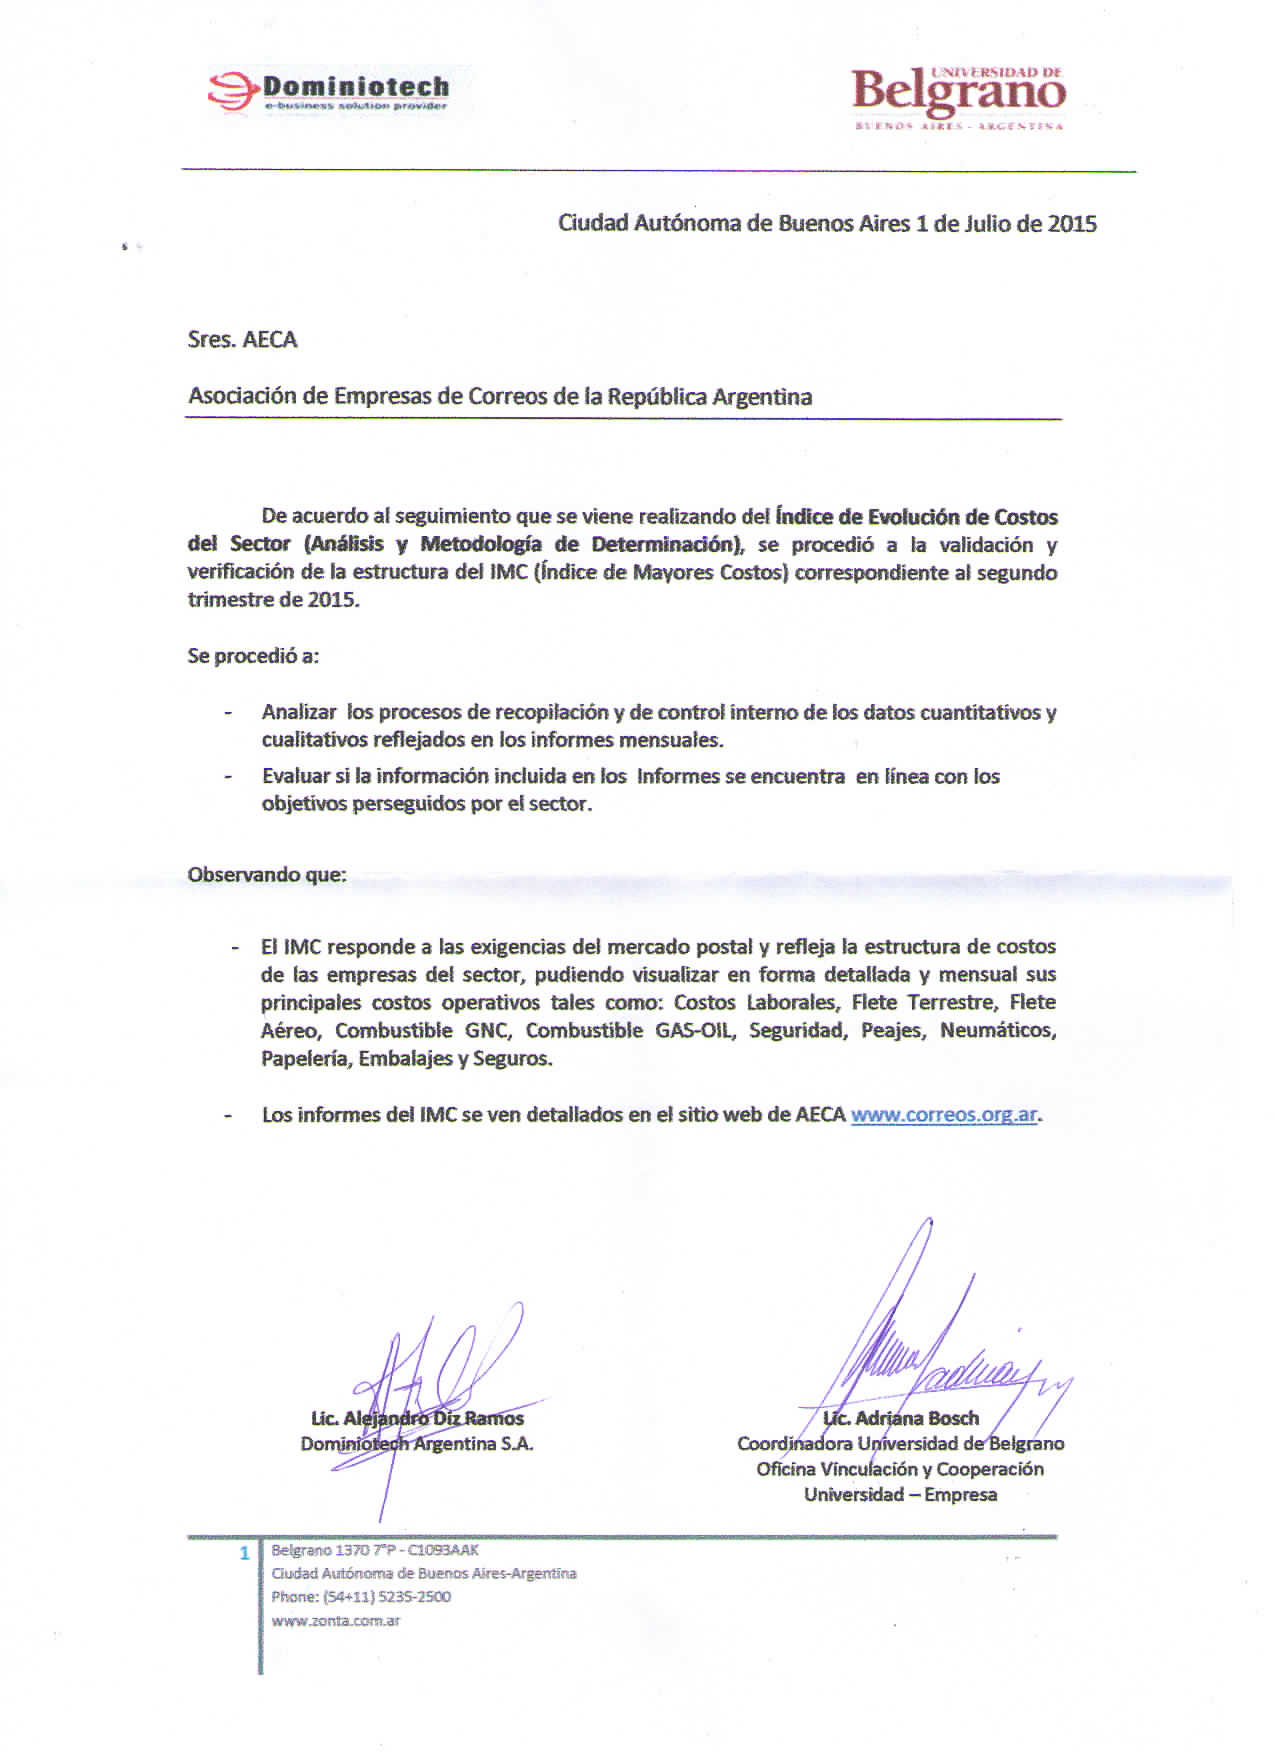 IMC - SEGUNDO TRIMESTRE 2015343